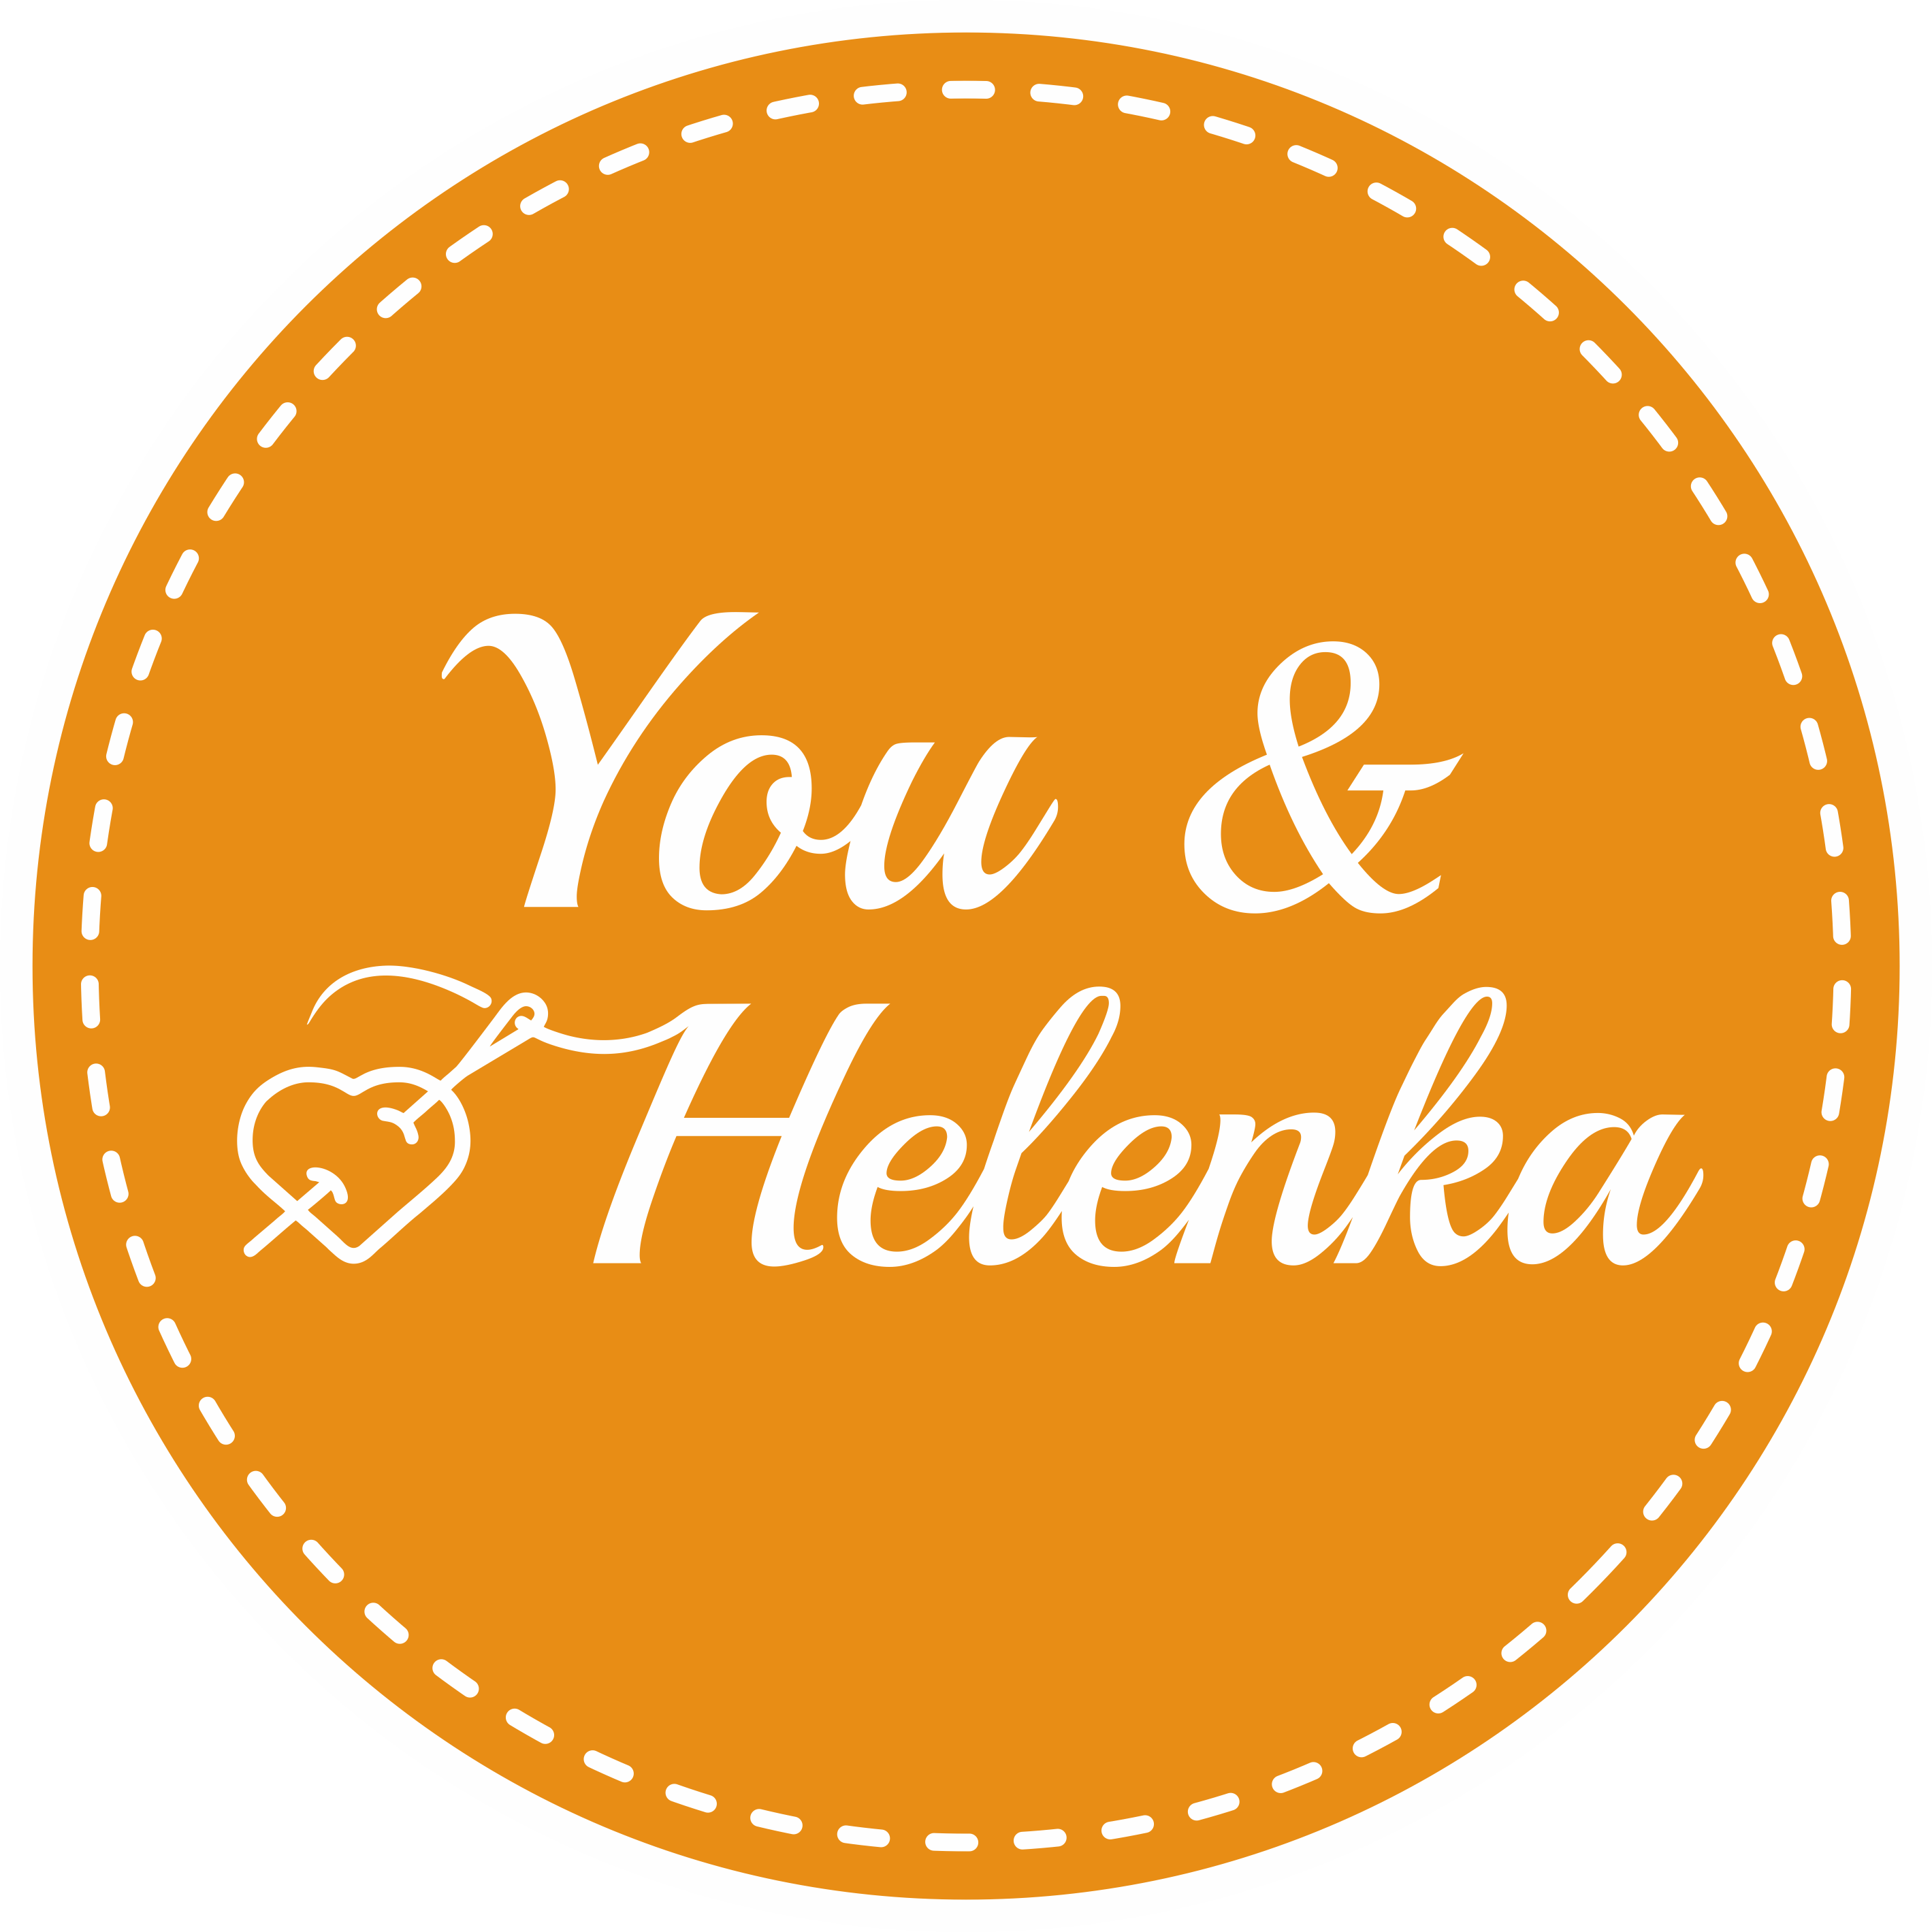 Helenka_logo_002